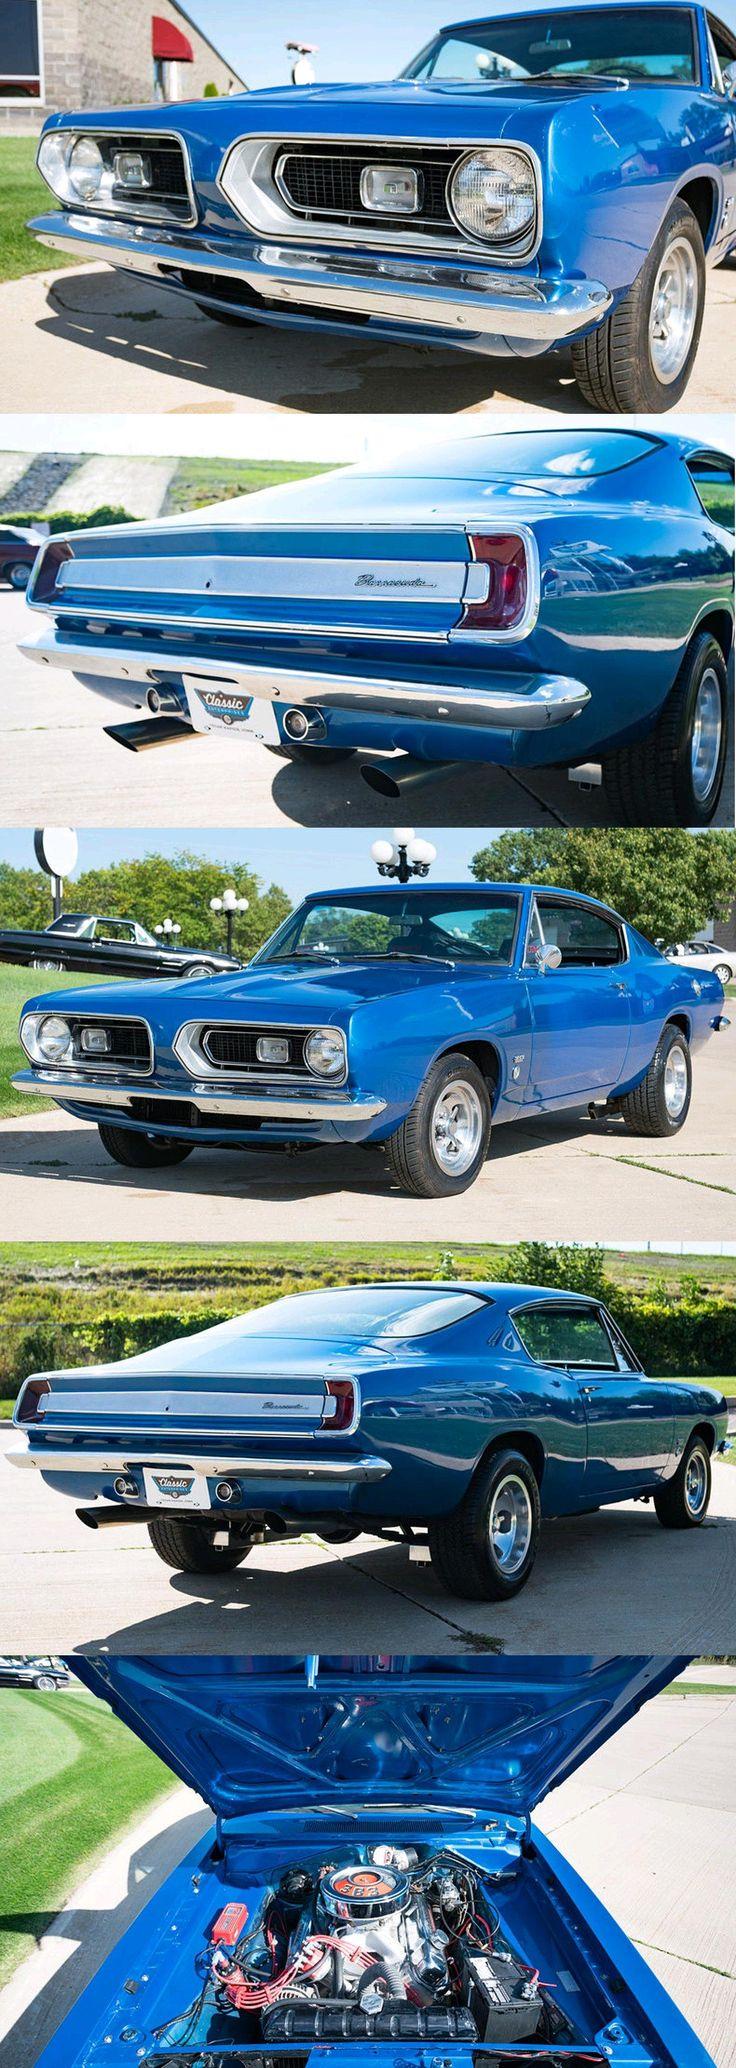 207 best Wheels - US - Plymouth images on Pinterest   Mopar ...